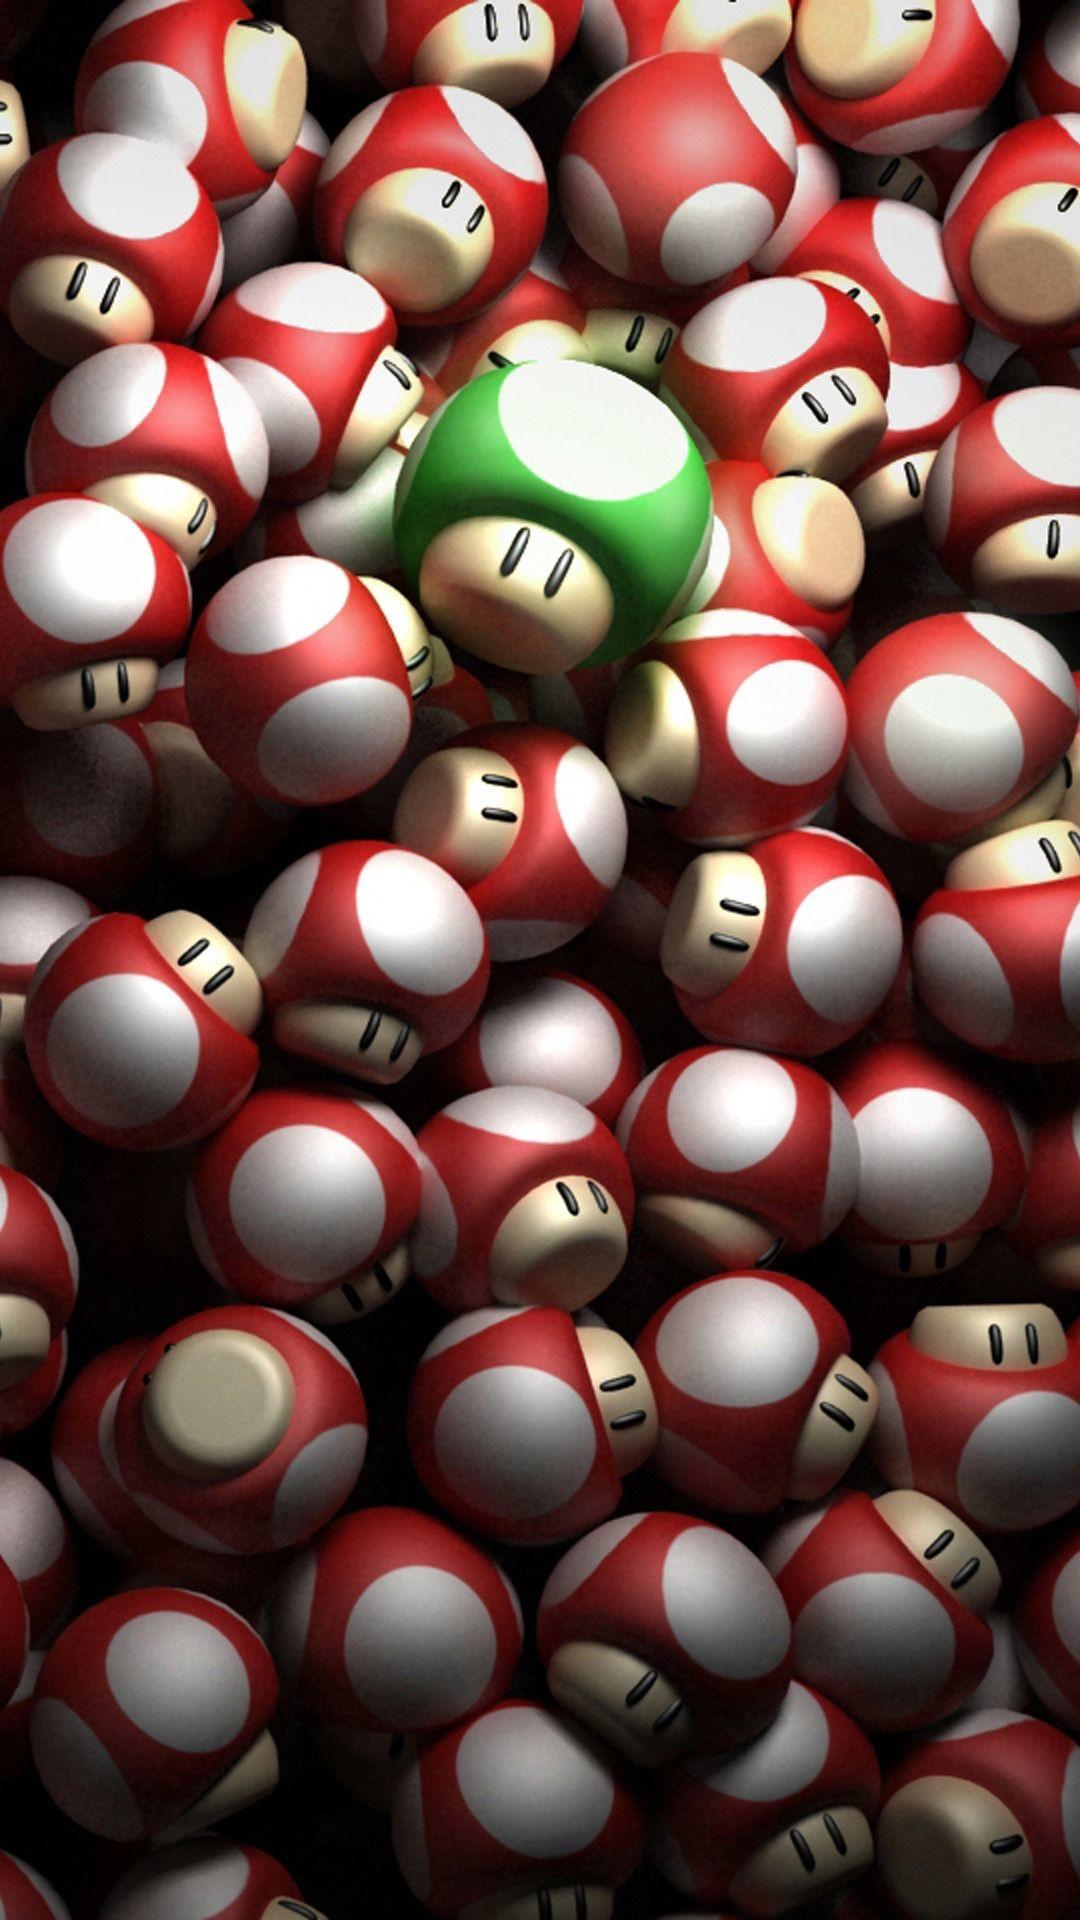 Res: 1080x1920, Mushroom Wallpaper, Super Mario Bros, Super Mario World, Super Mario  Brothers, Mario